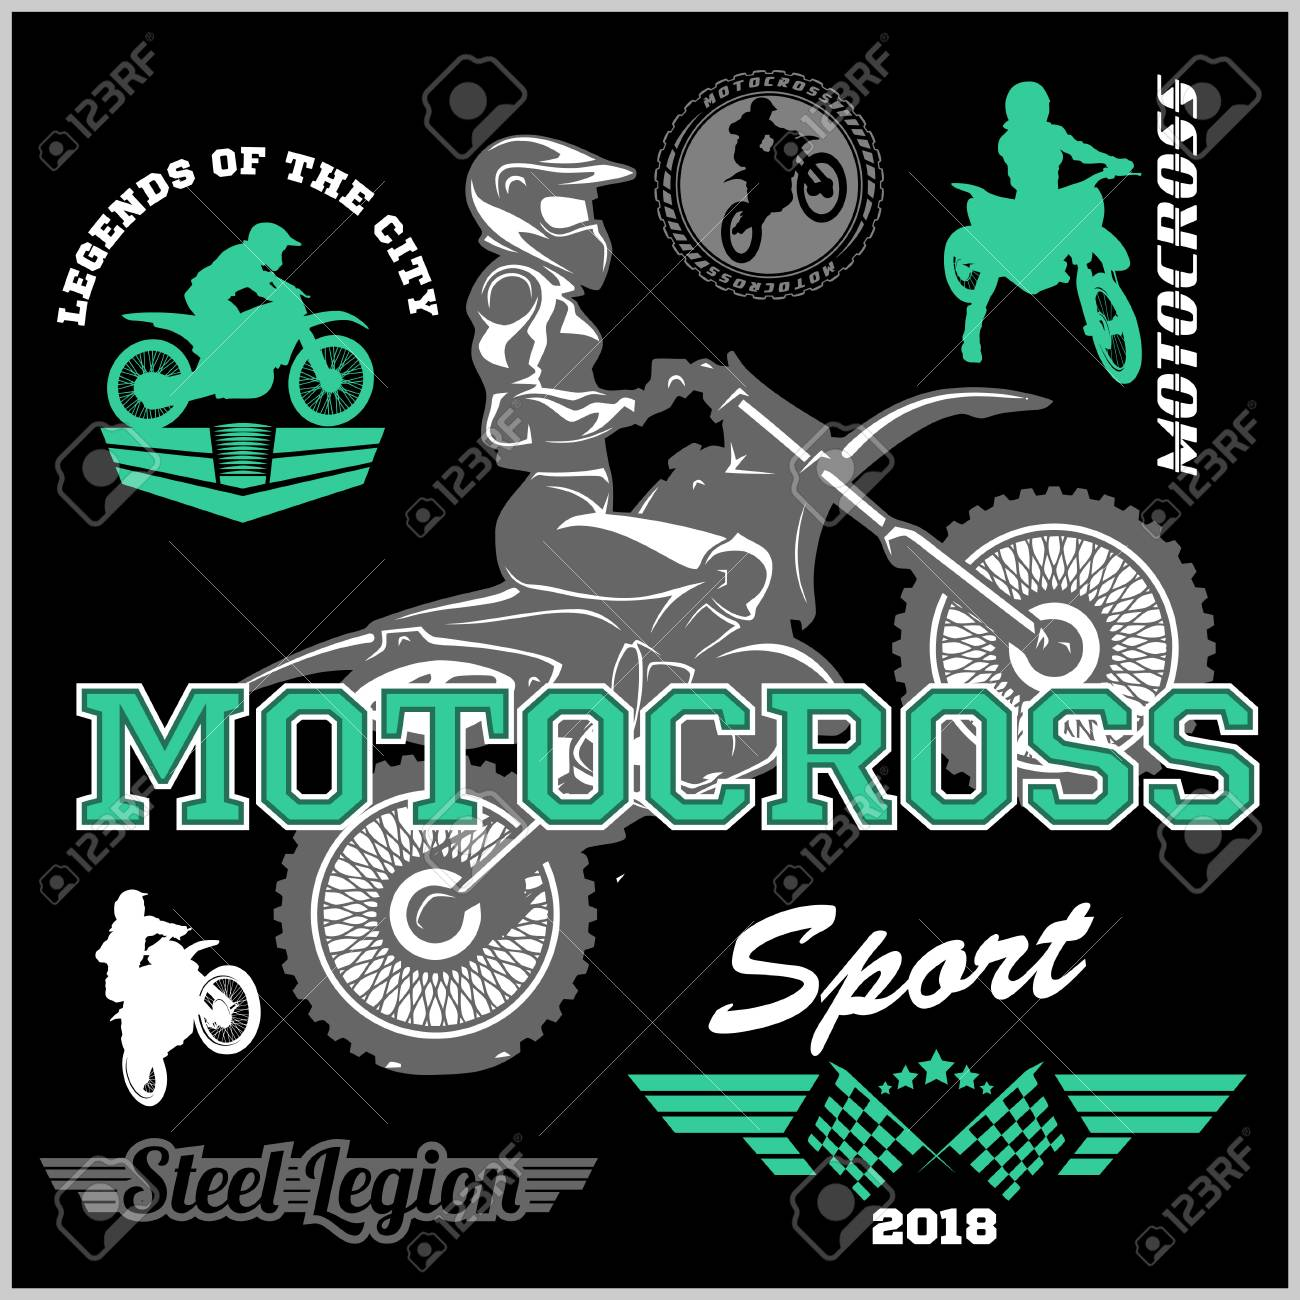 Motocross Rider Badge Logo Emblem Vector Illustration Royalty Free Cliparts Vectors And Stock Illustration Image 85034236